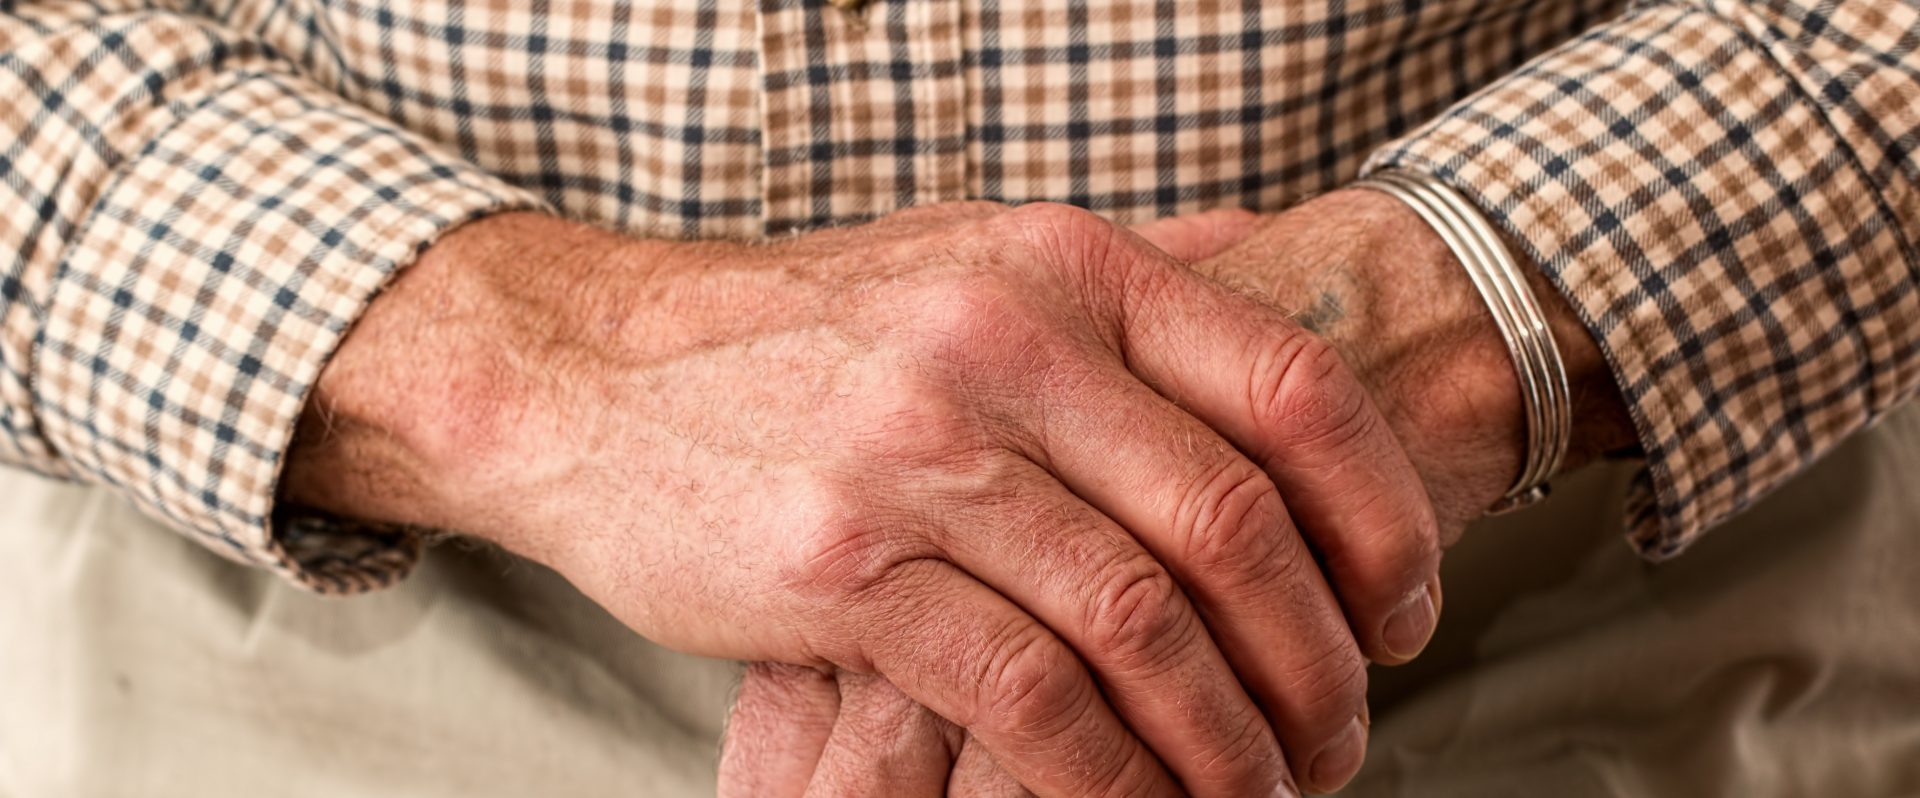 Close up of older gentleman's hands and walking stick